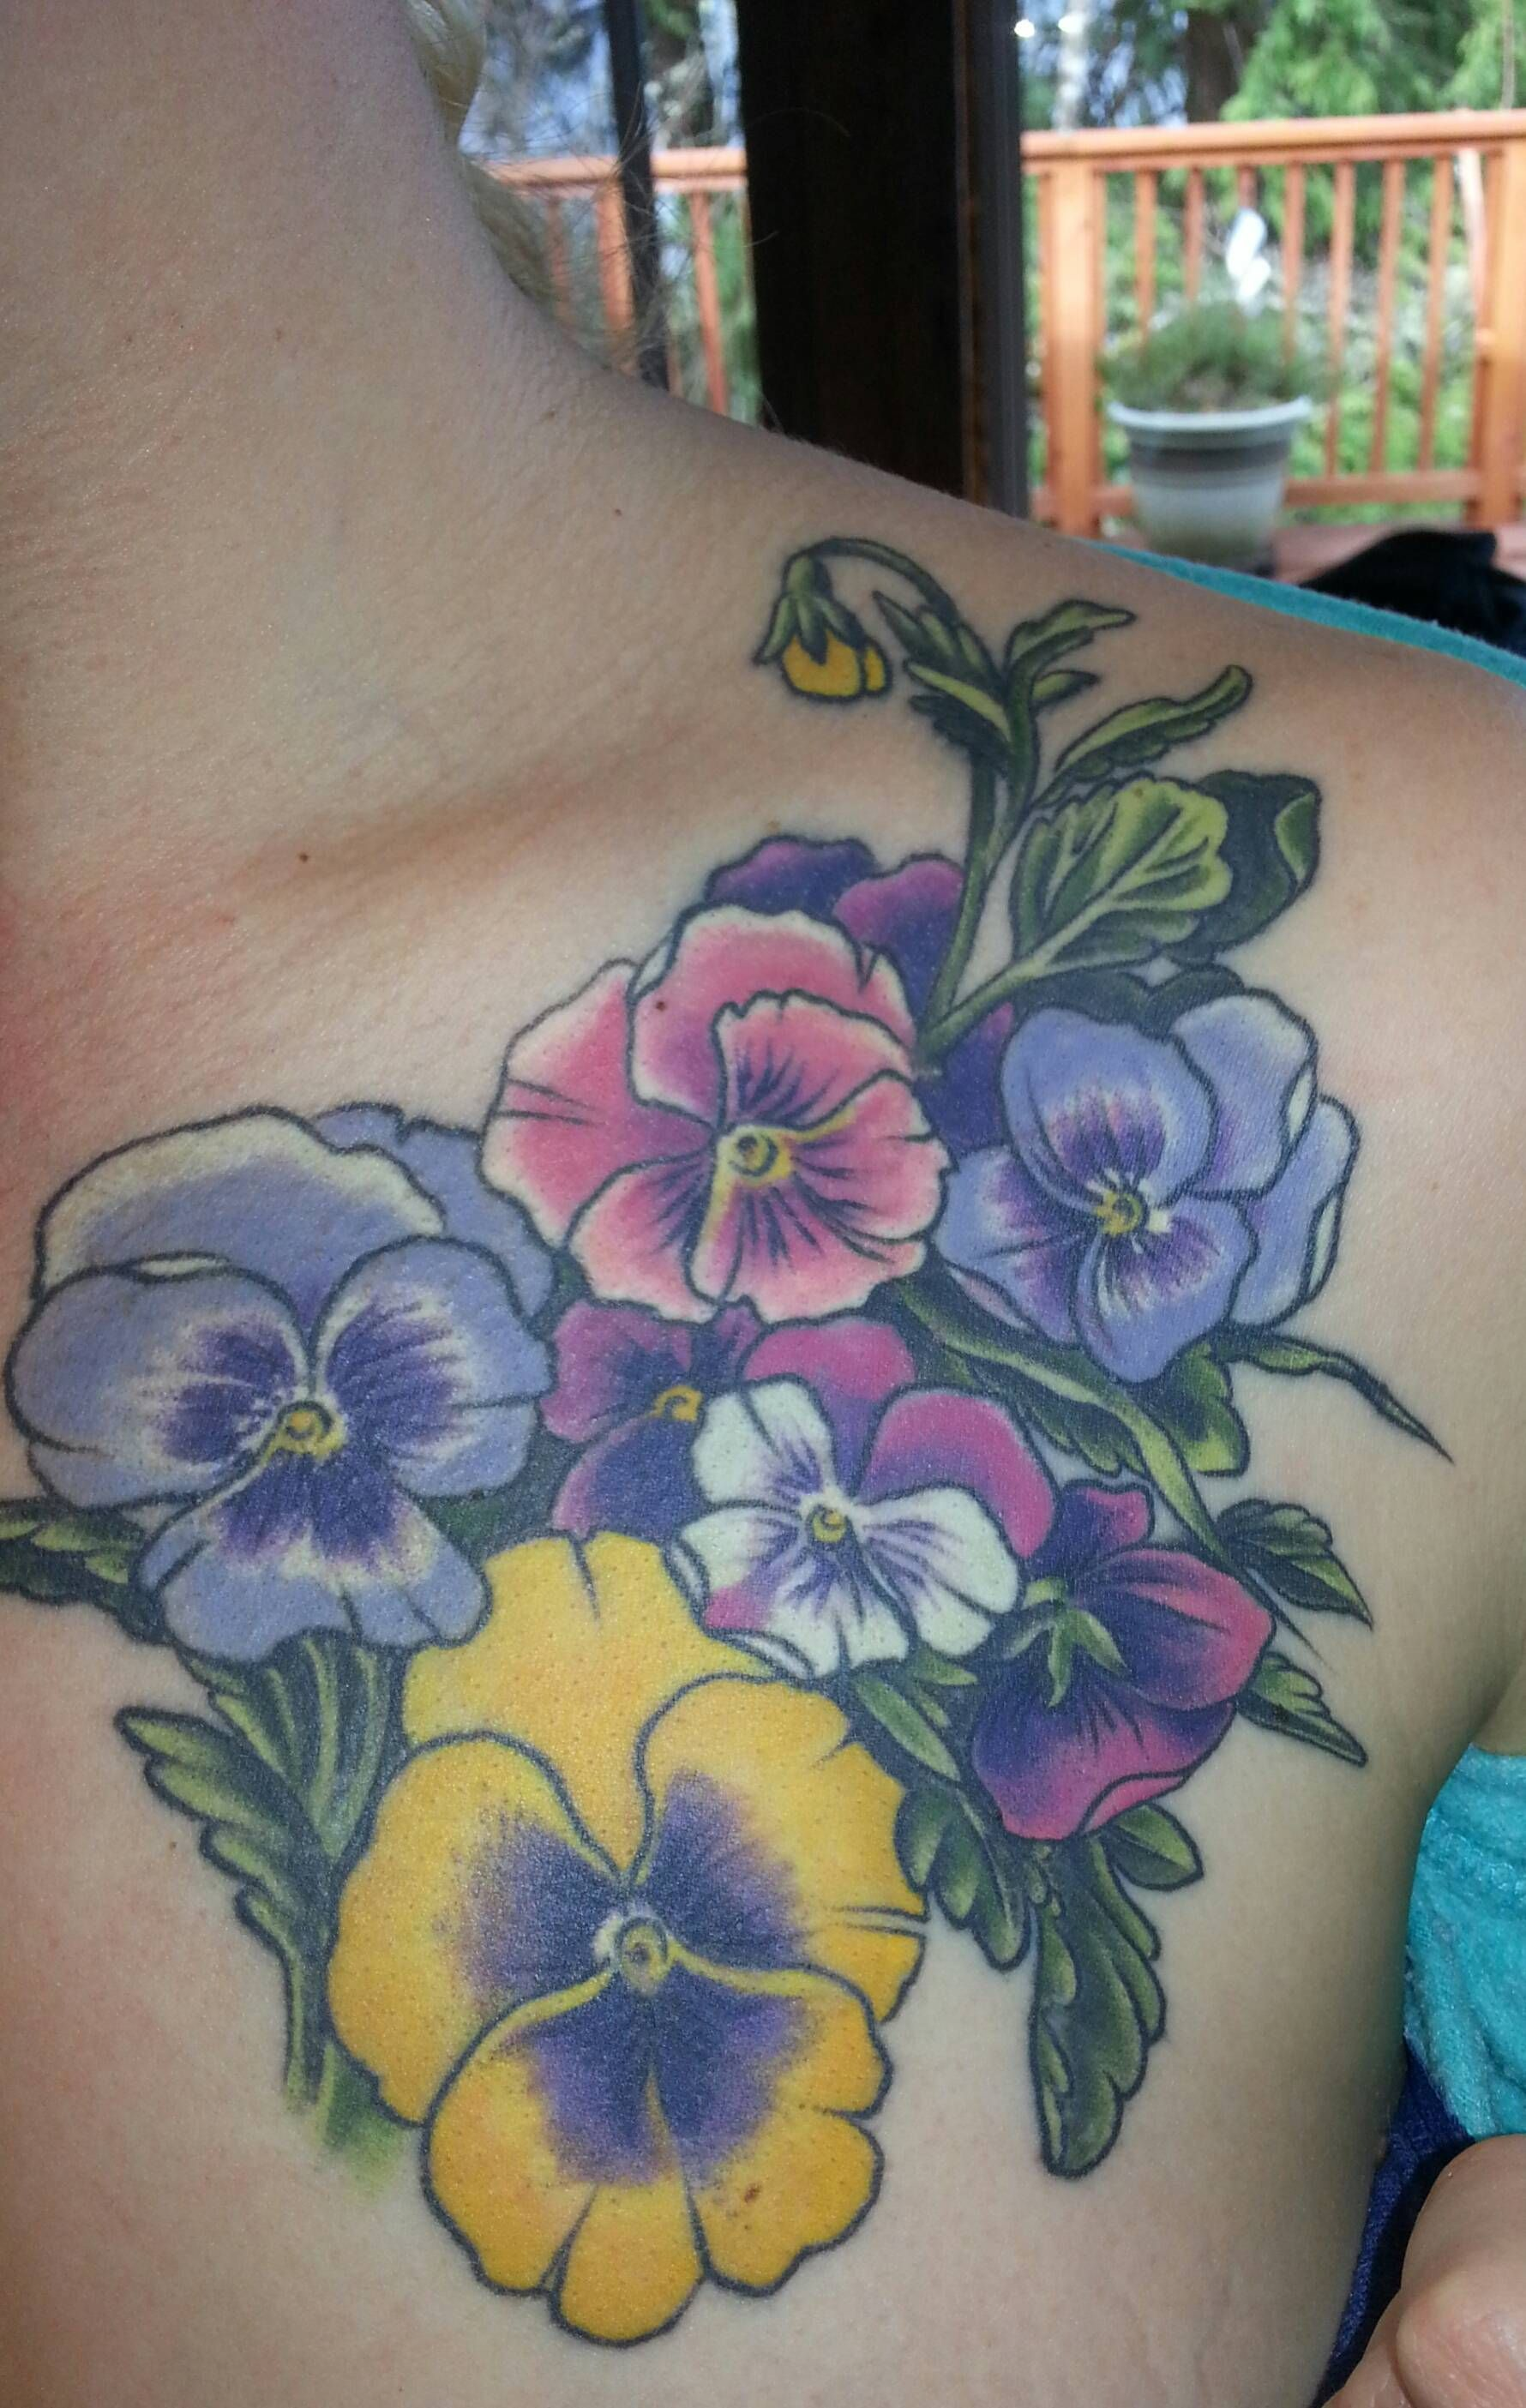 Pansy tattoo house of tattoo tac wa imgur pansy